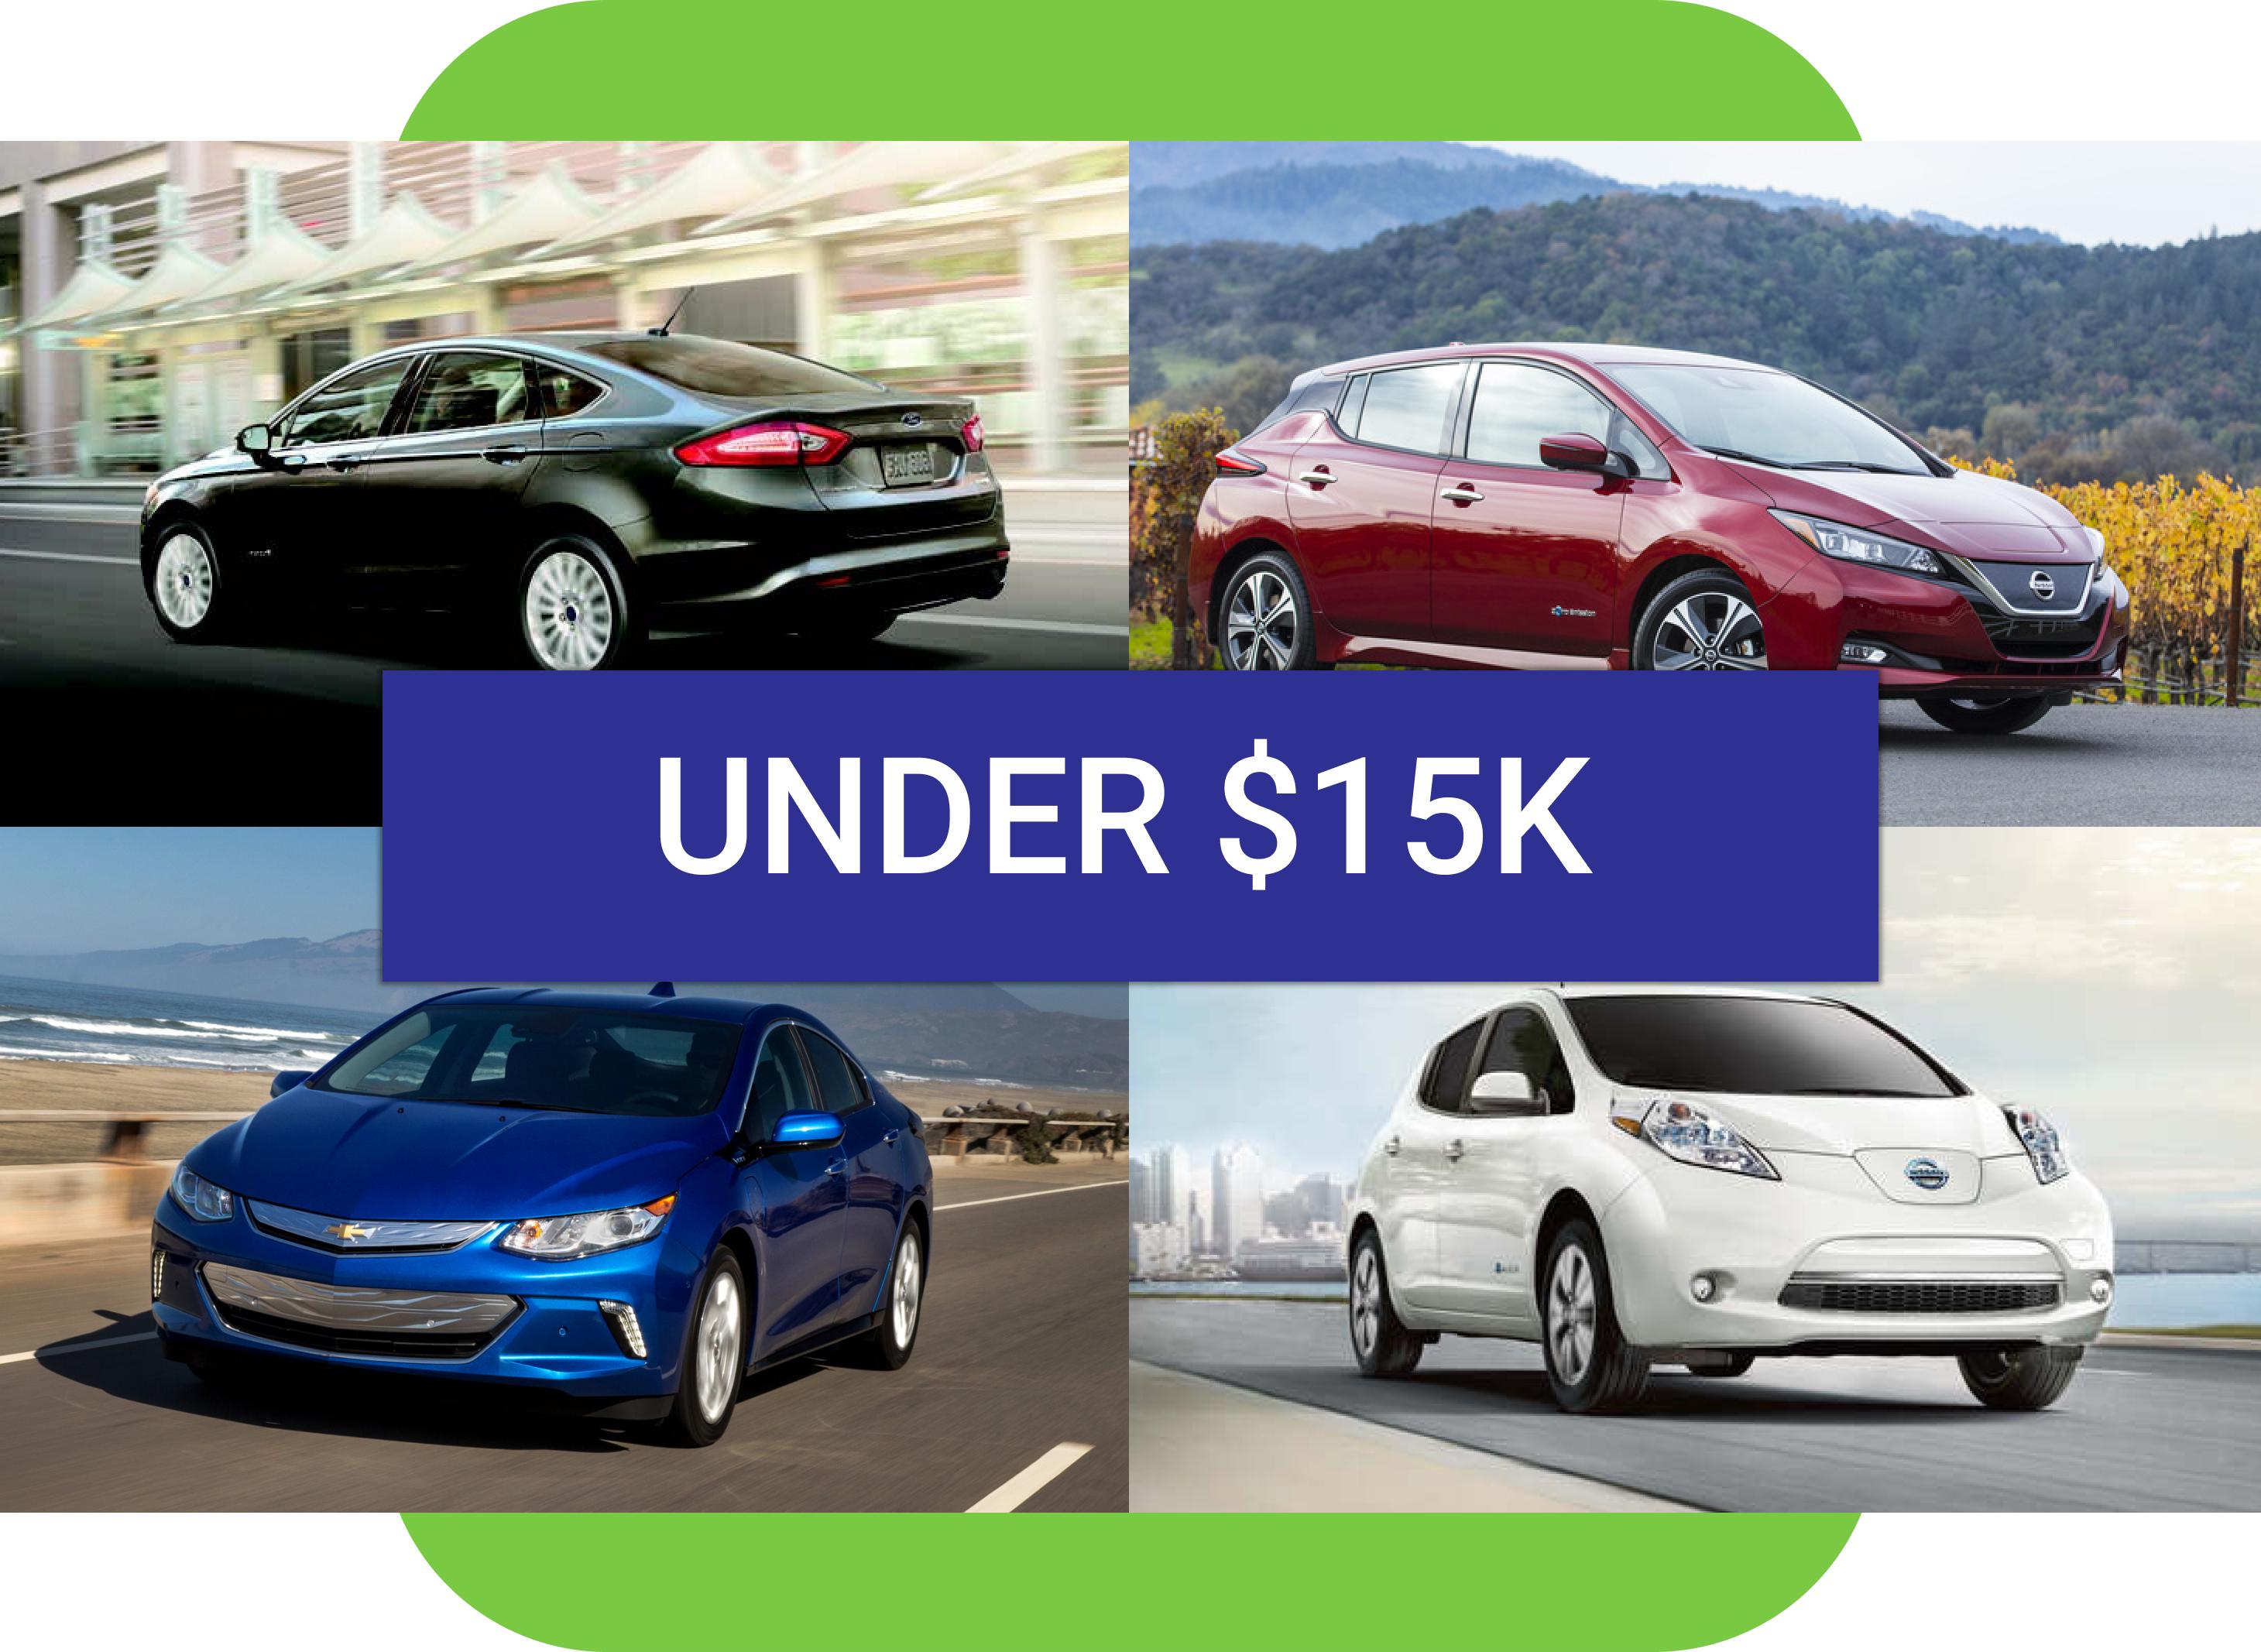 Best used EV under $15k